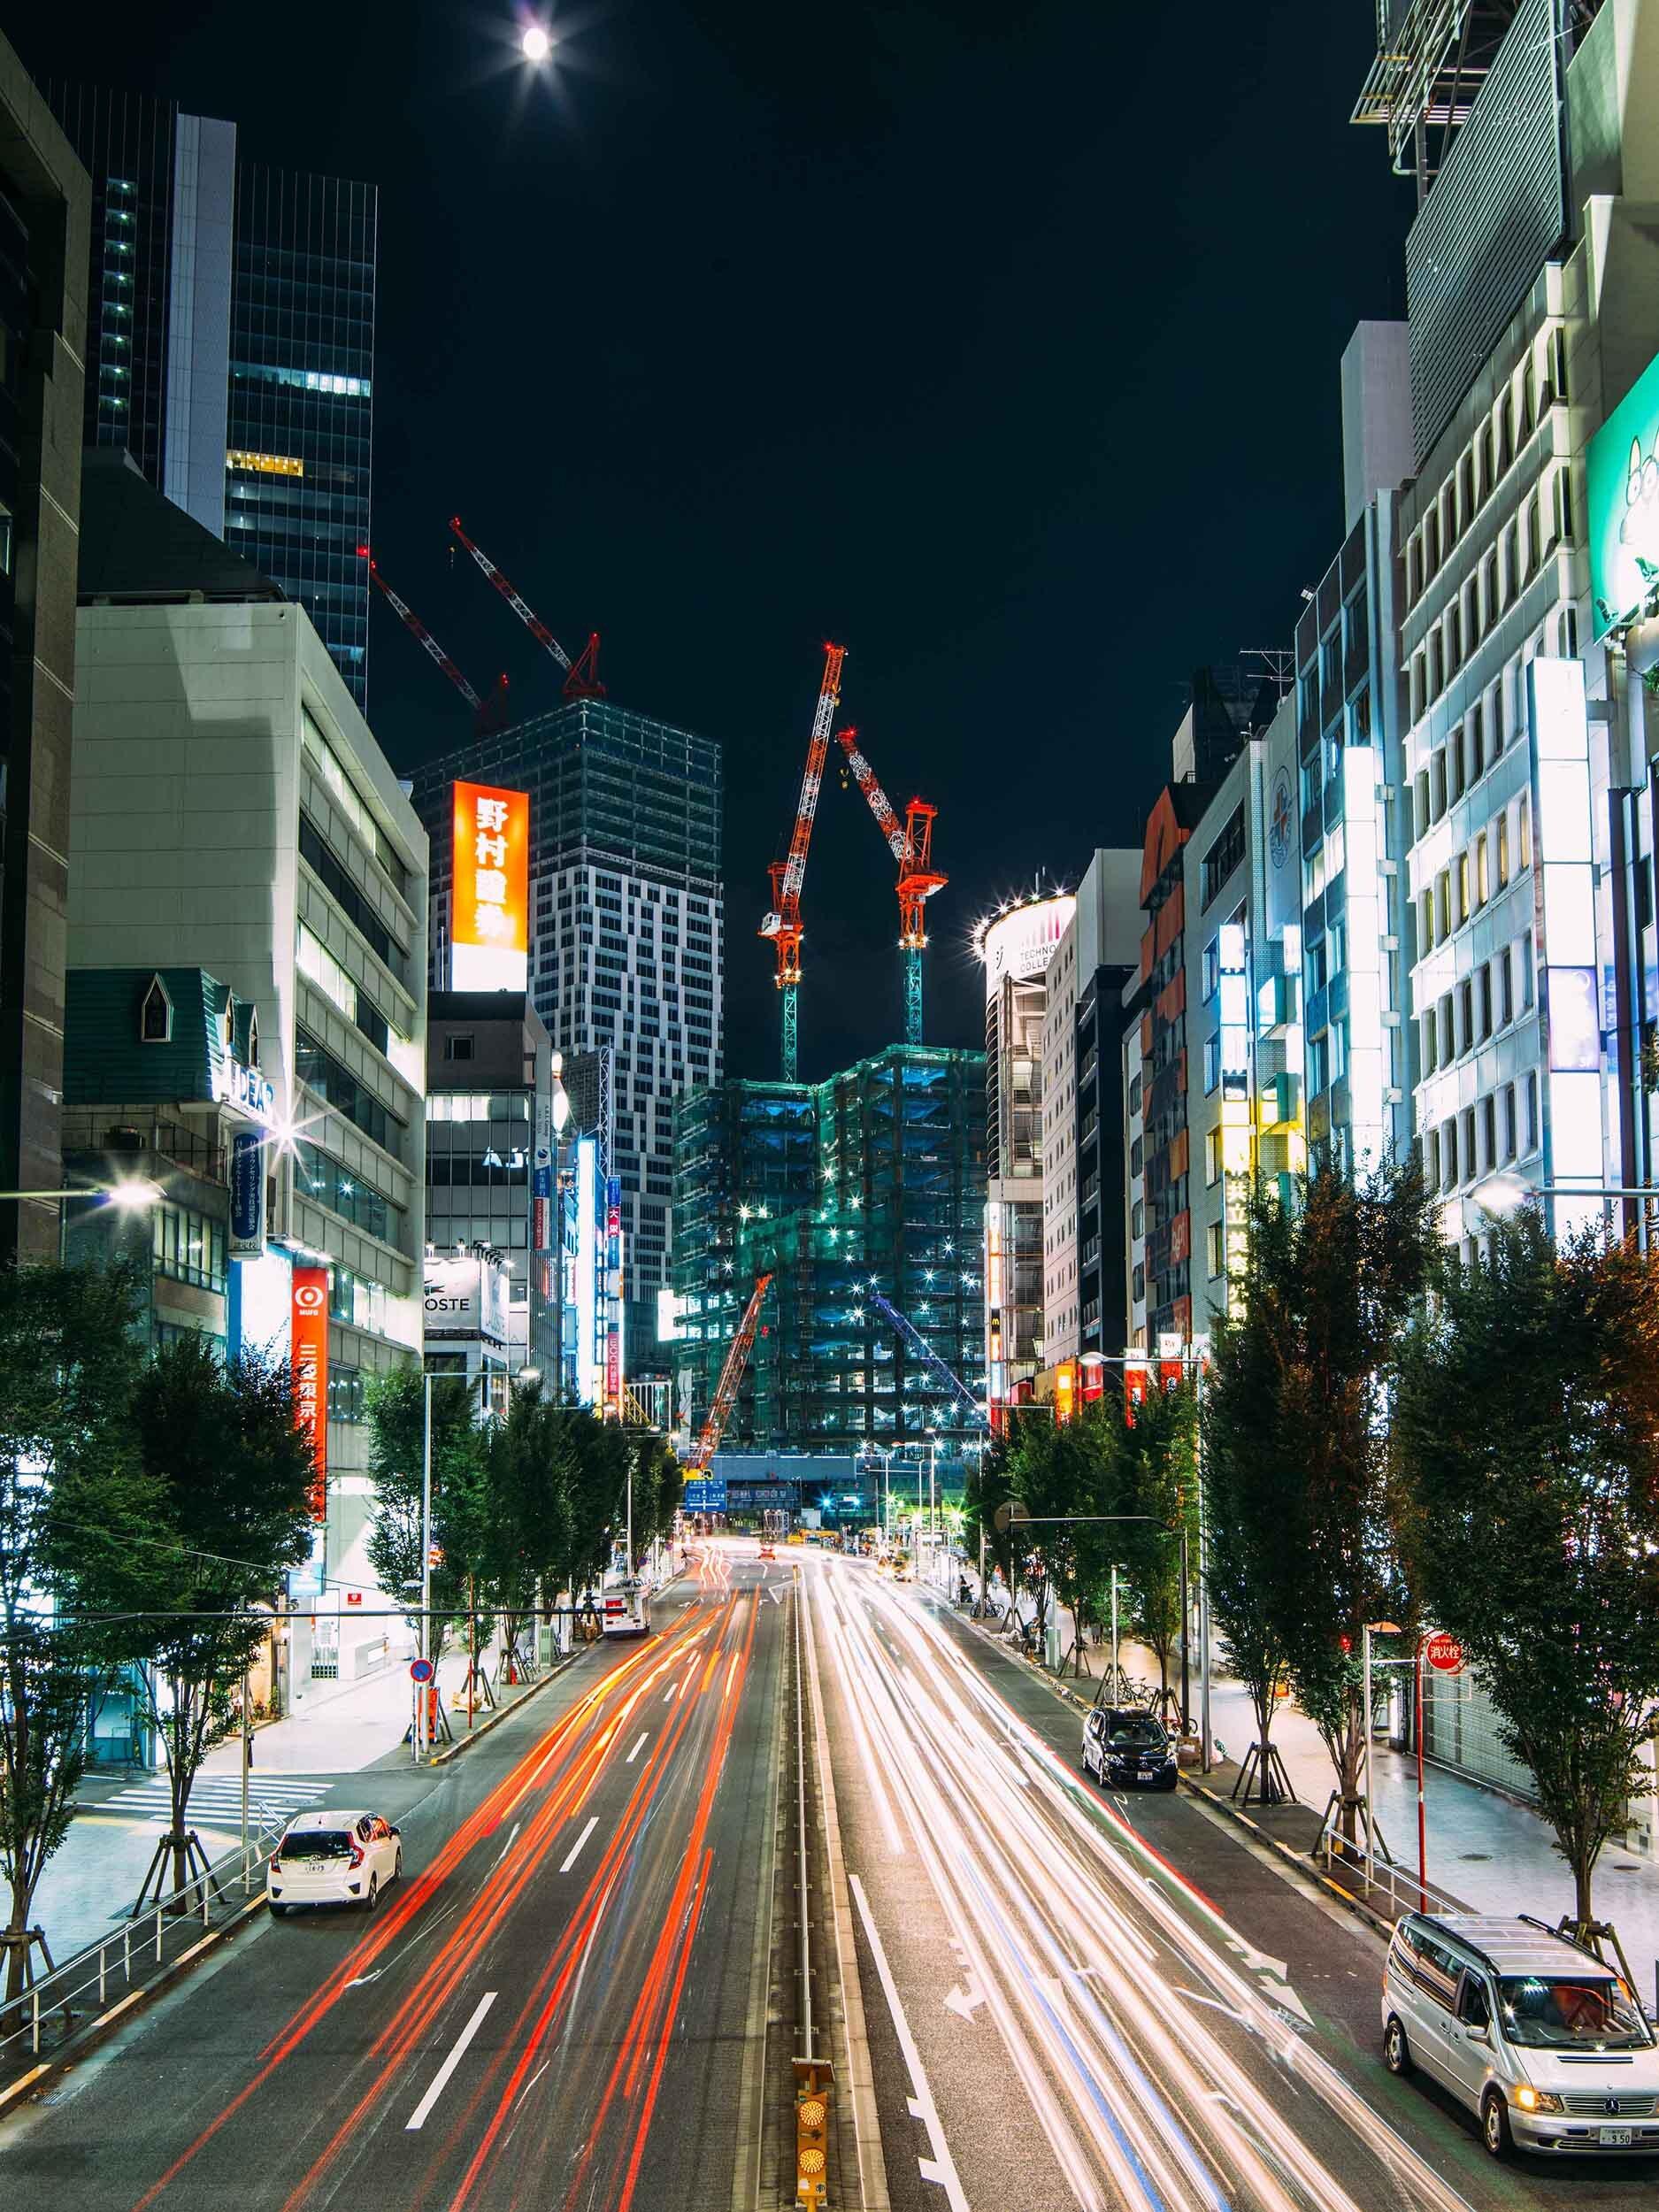 shibuya-urban-landscape.jpg